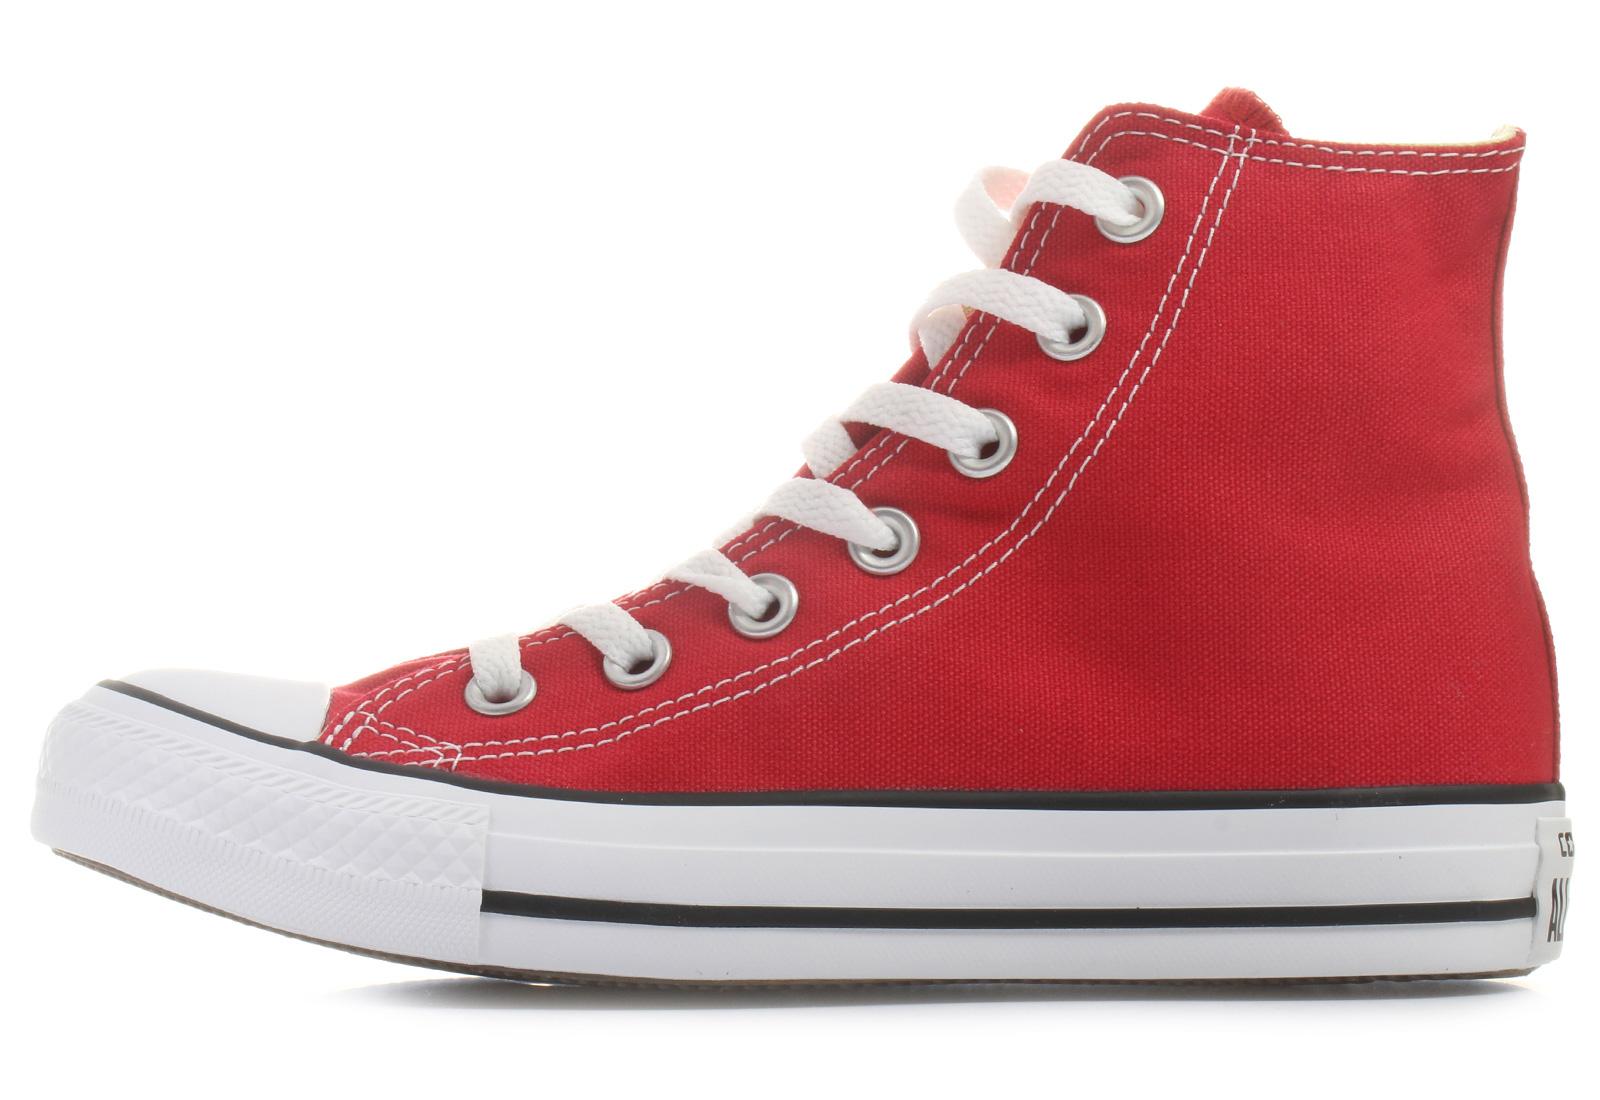 Converse Tornacipő - Ct As Core Hi - M9621C - Office Shoes Magyarország 44628d4b98